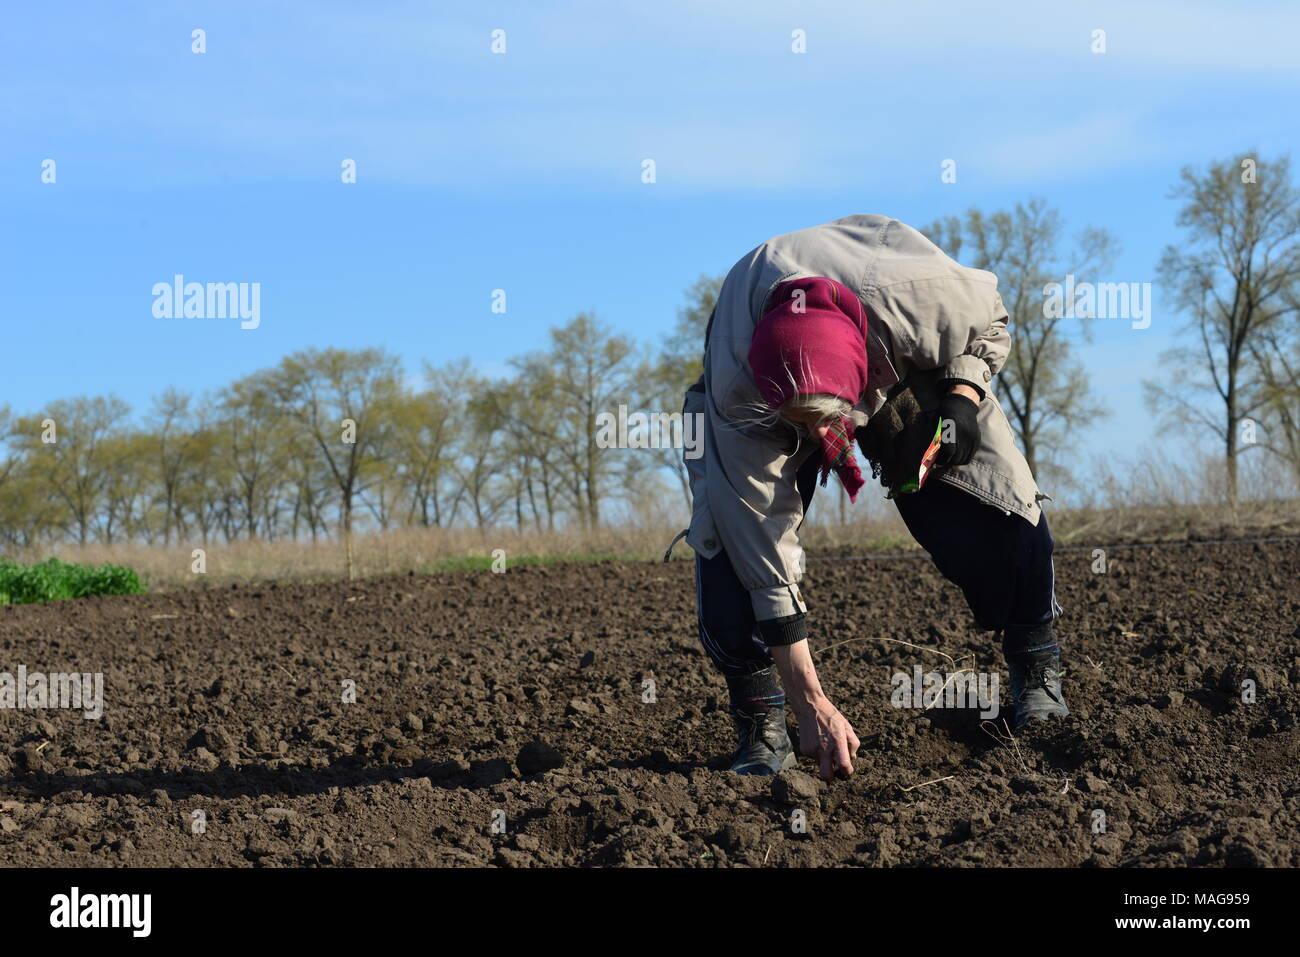 Spring season work at subsistence garden, Ukraine - Stock Image